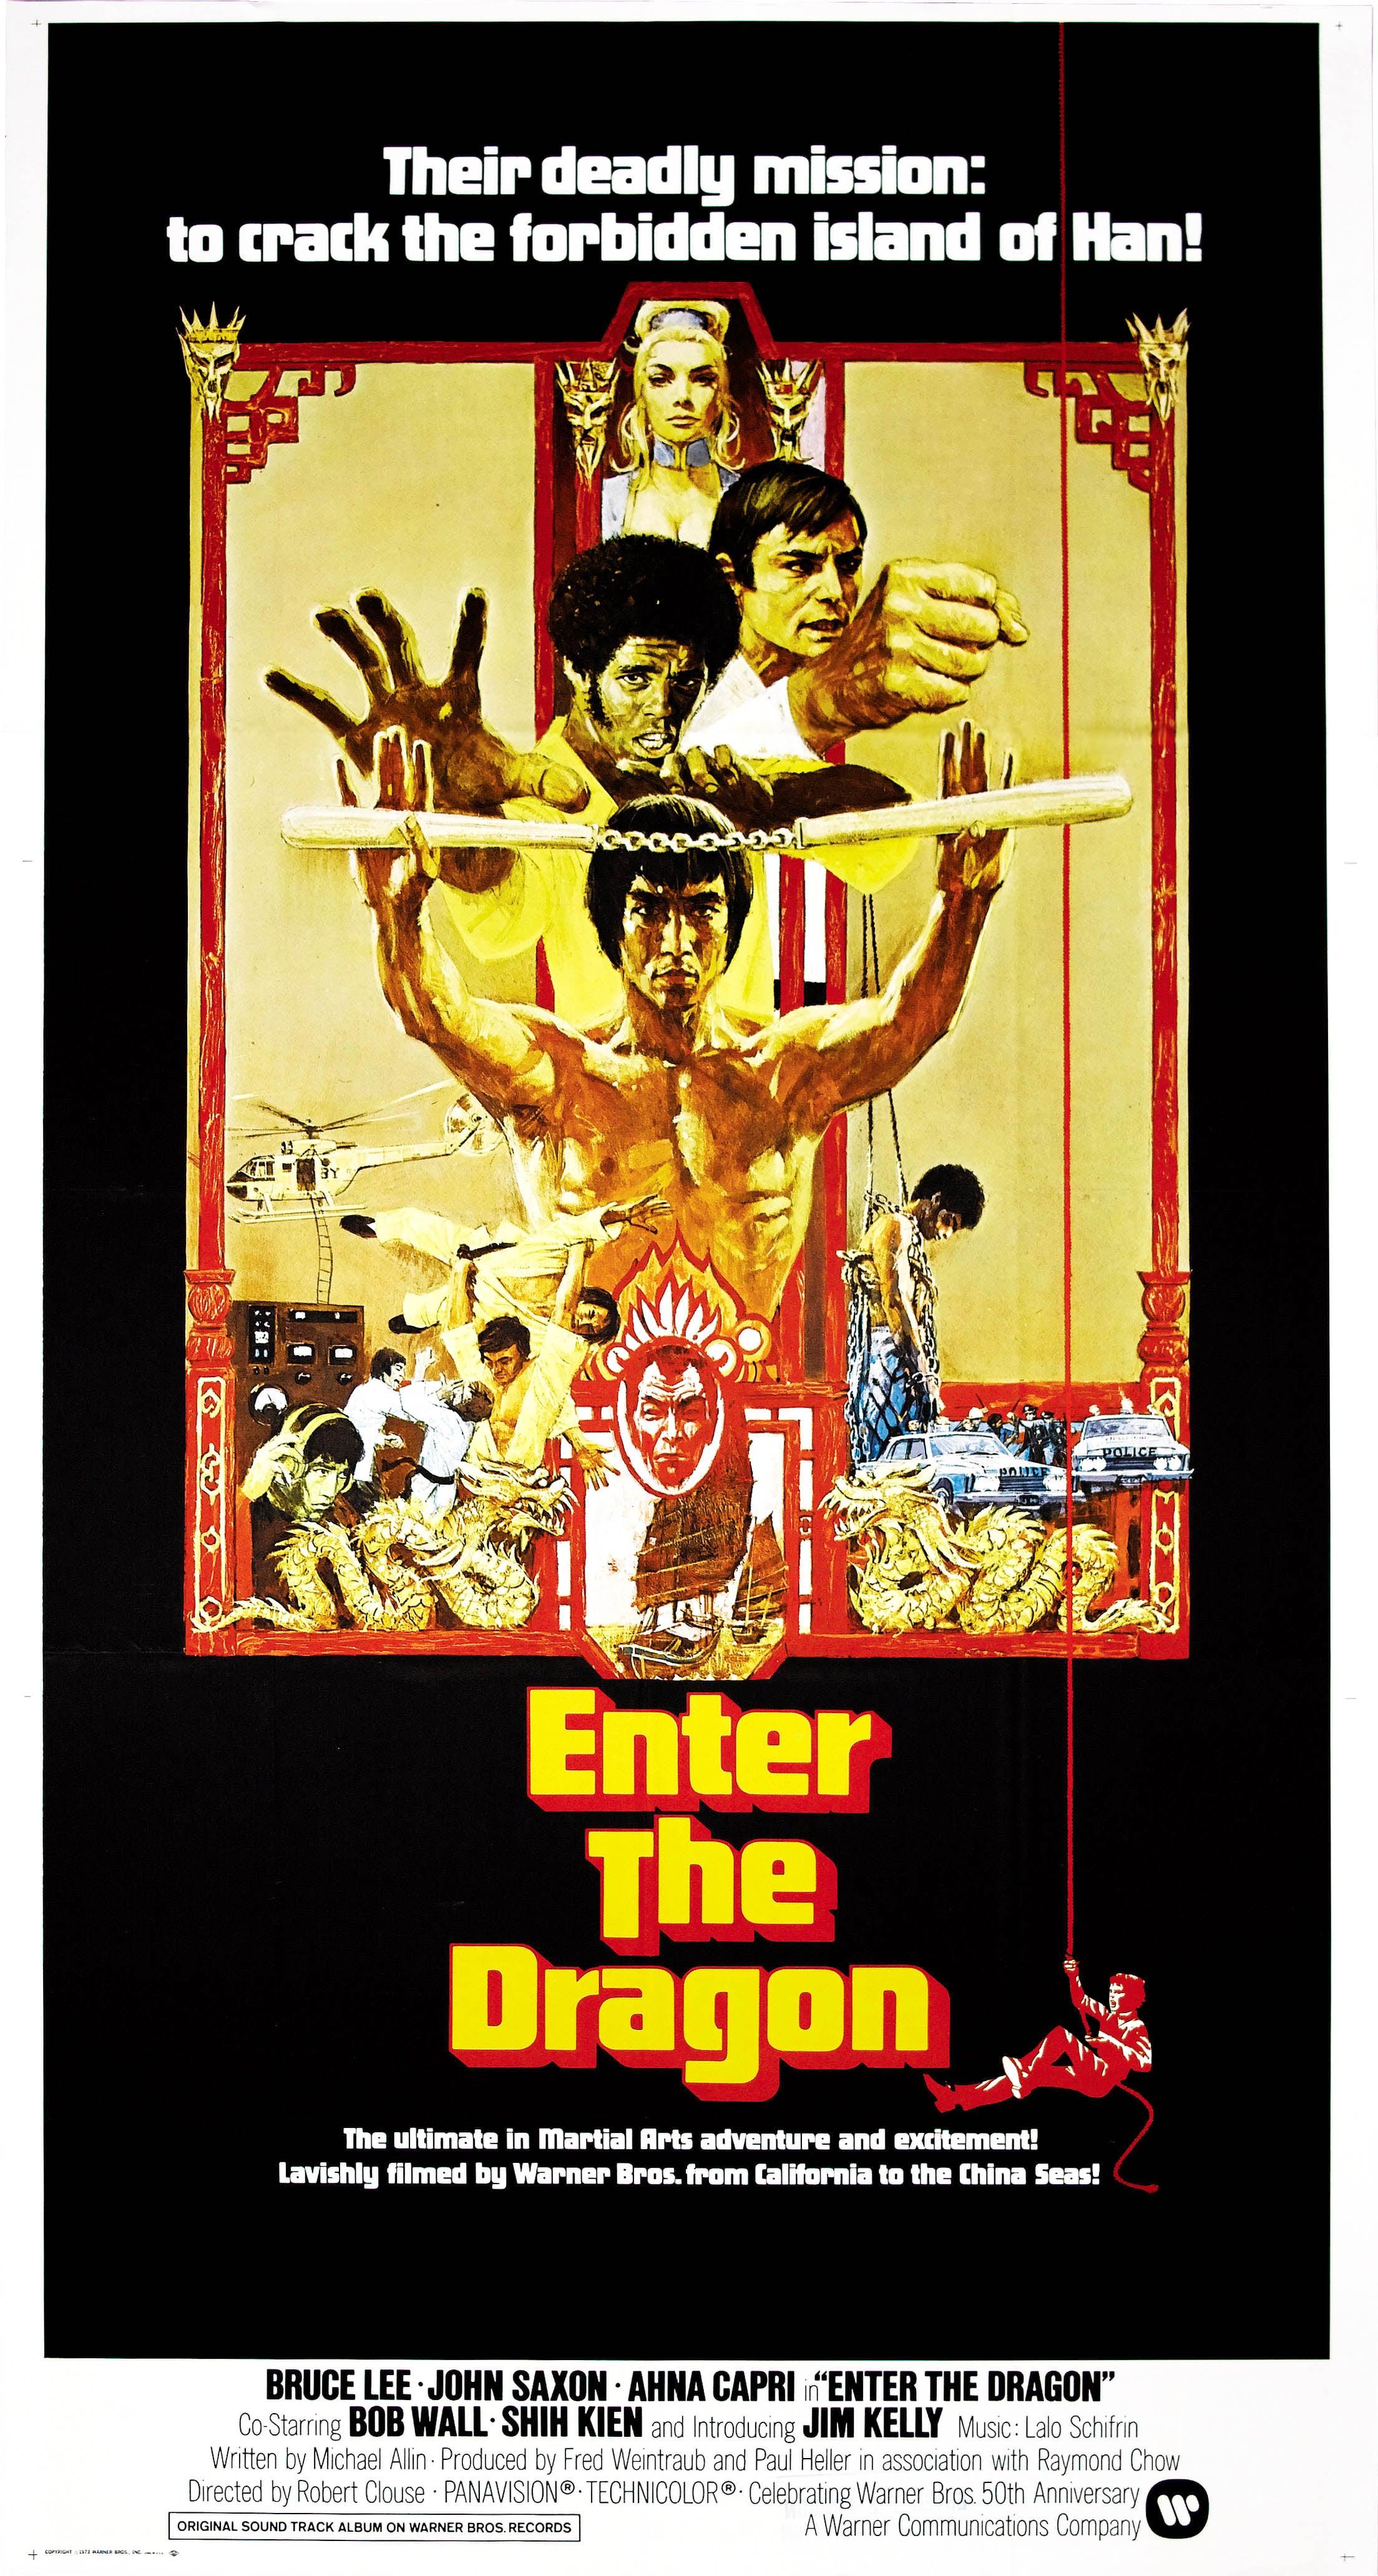 enter_the_dragon_poster_002.jpg